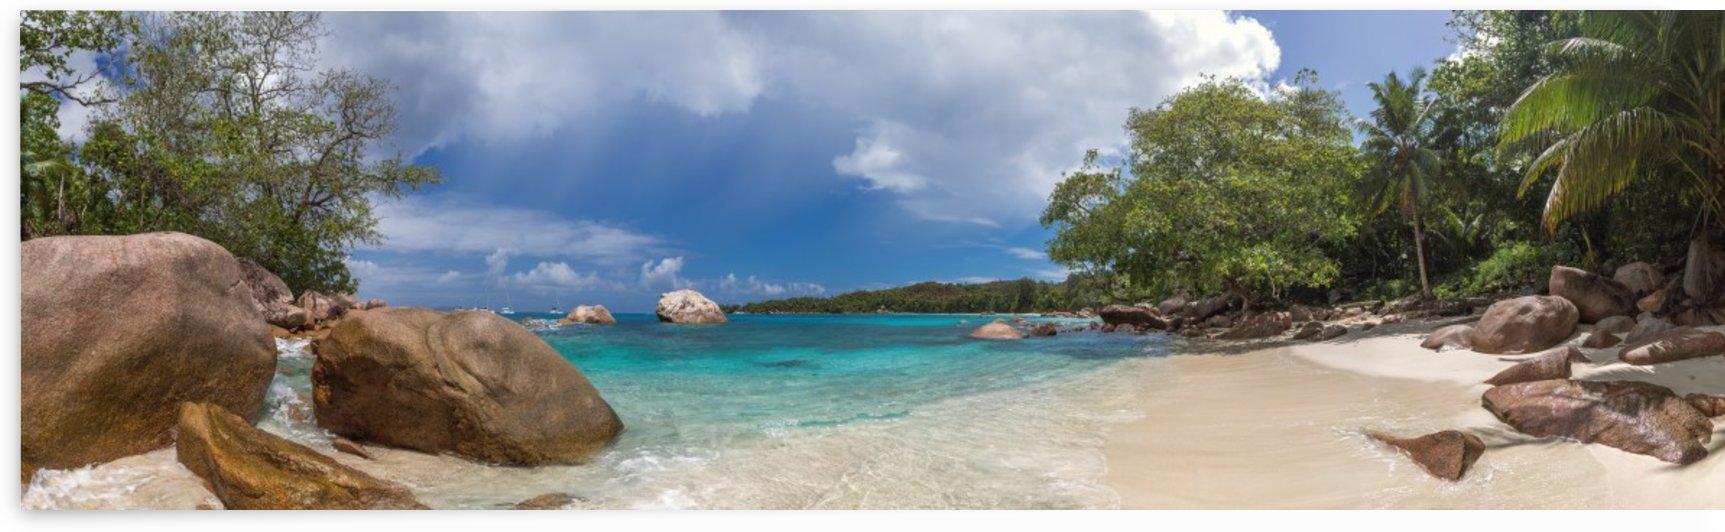 My favorite beach by Dmiry Laudin